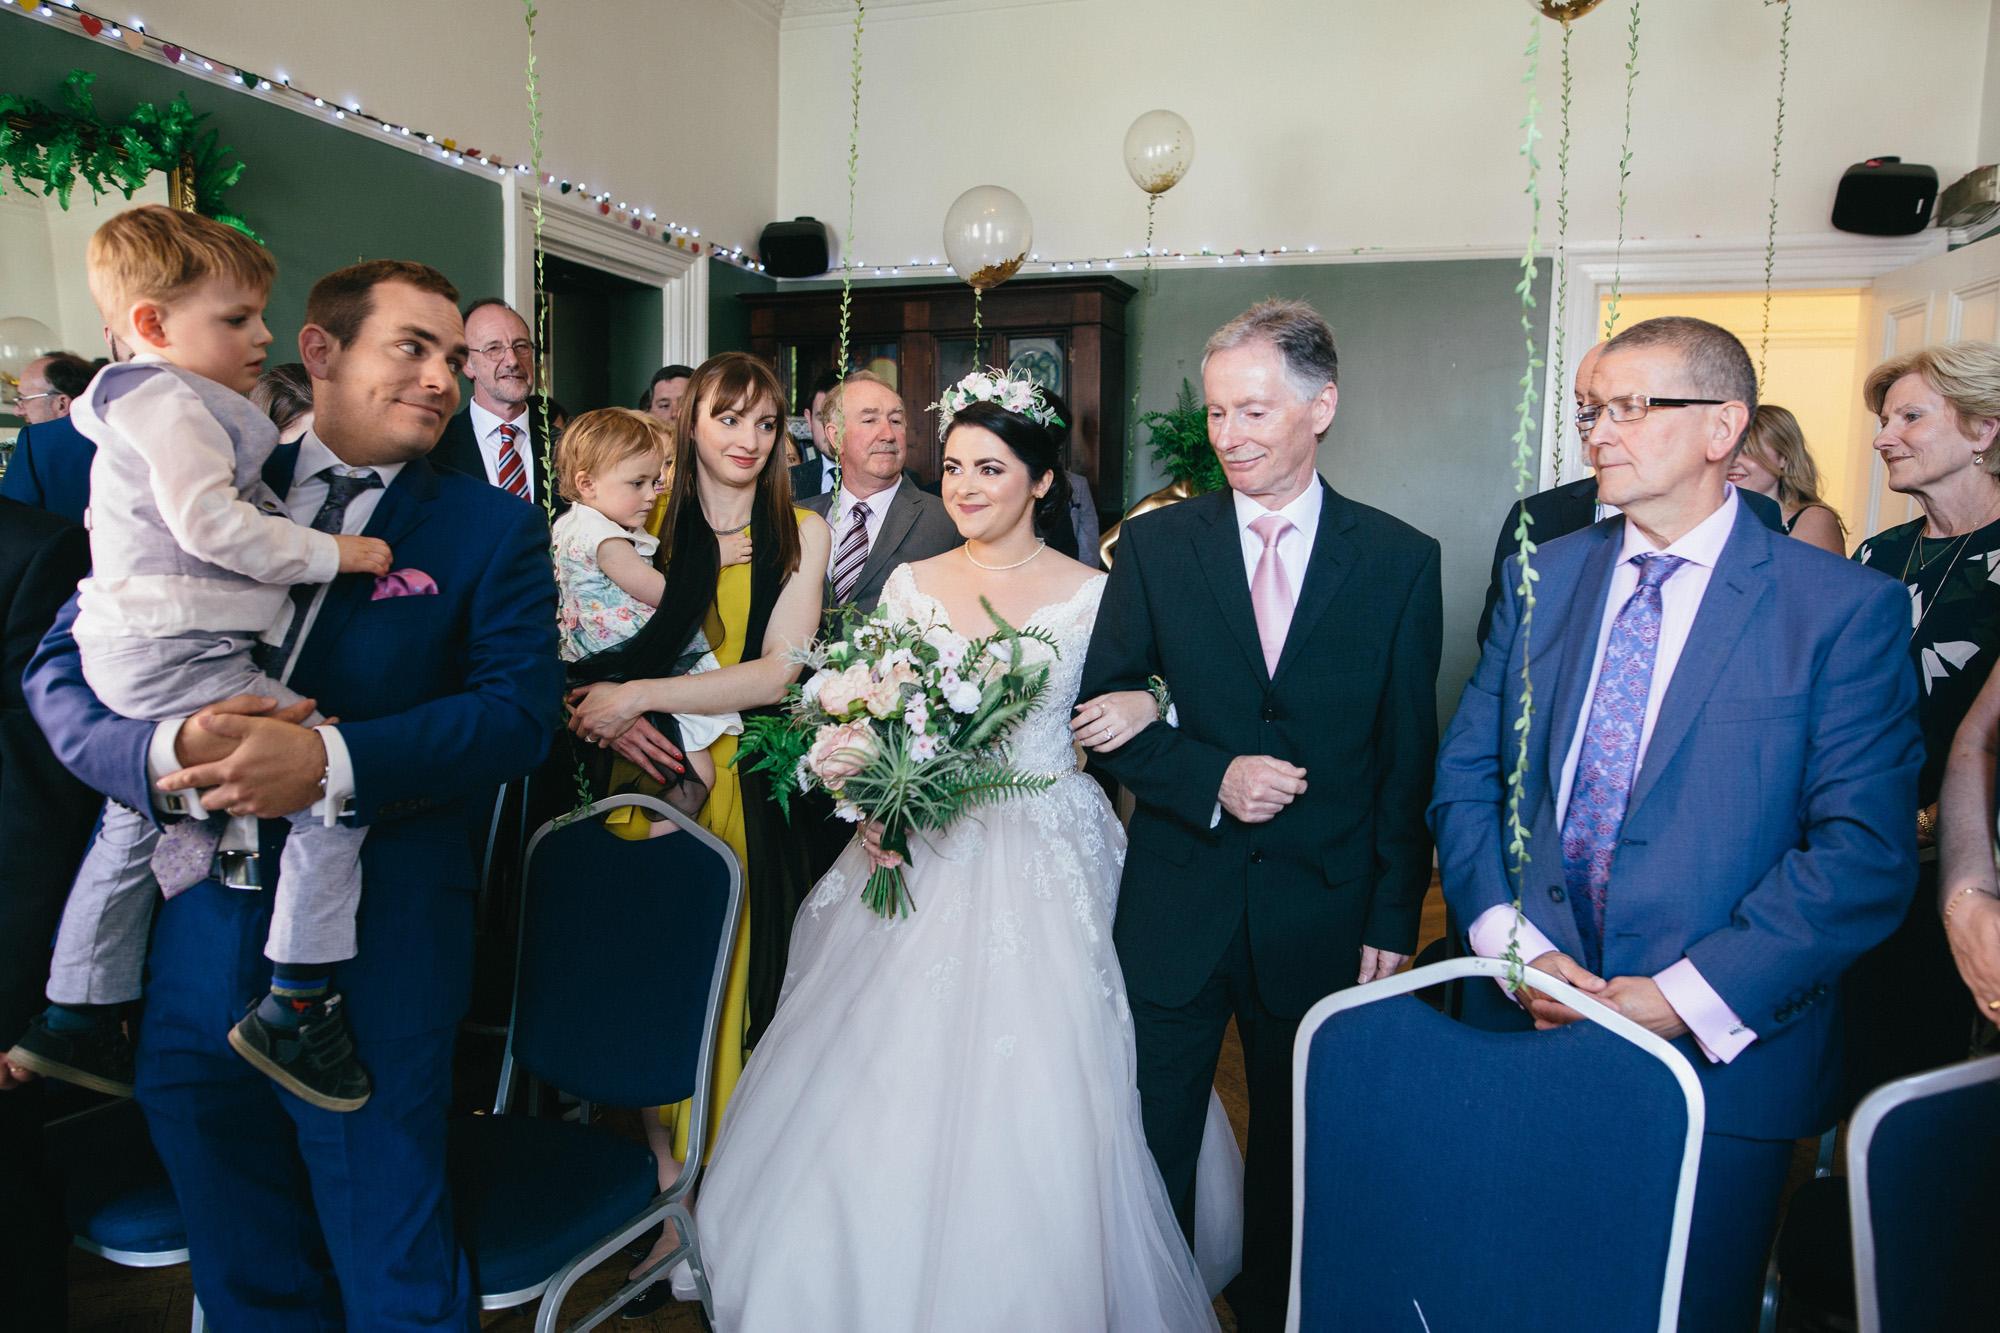 Quirky Wedding Photography Glasgow West End 023.jpg